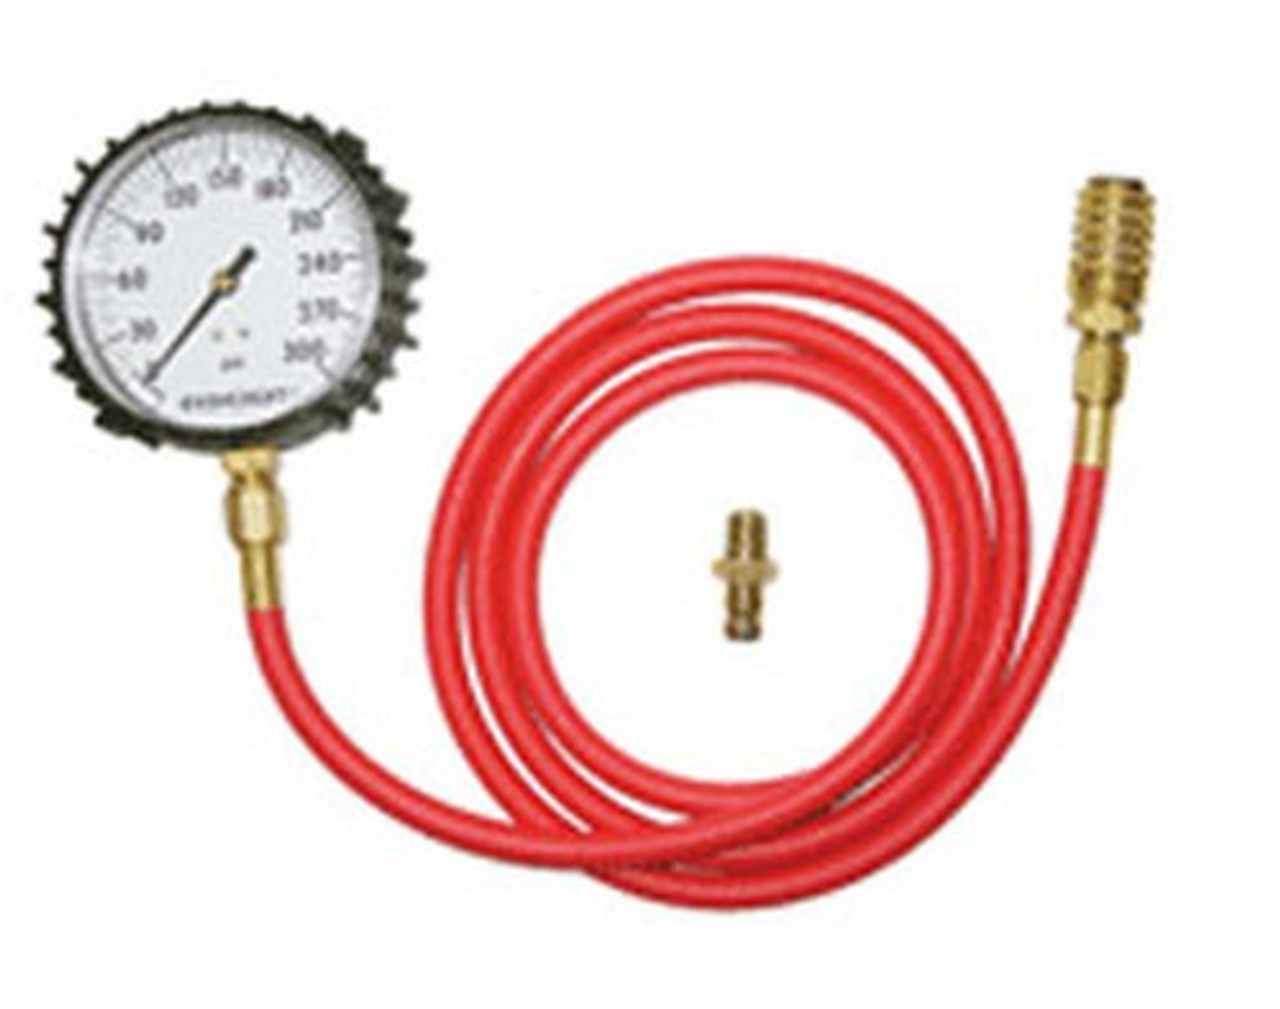 0 to 300 psi Compuchek Fuel System Pressure Tester Gauge Brand New! TU-32-20